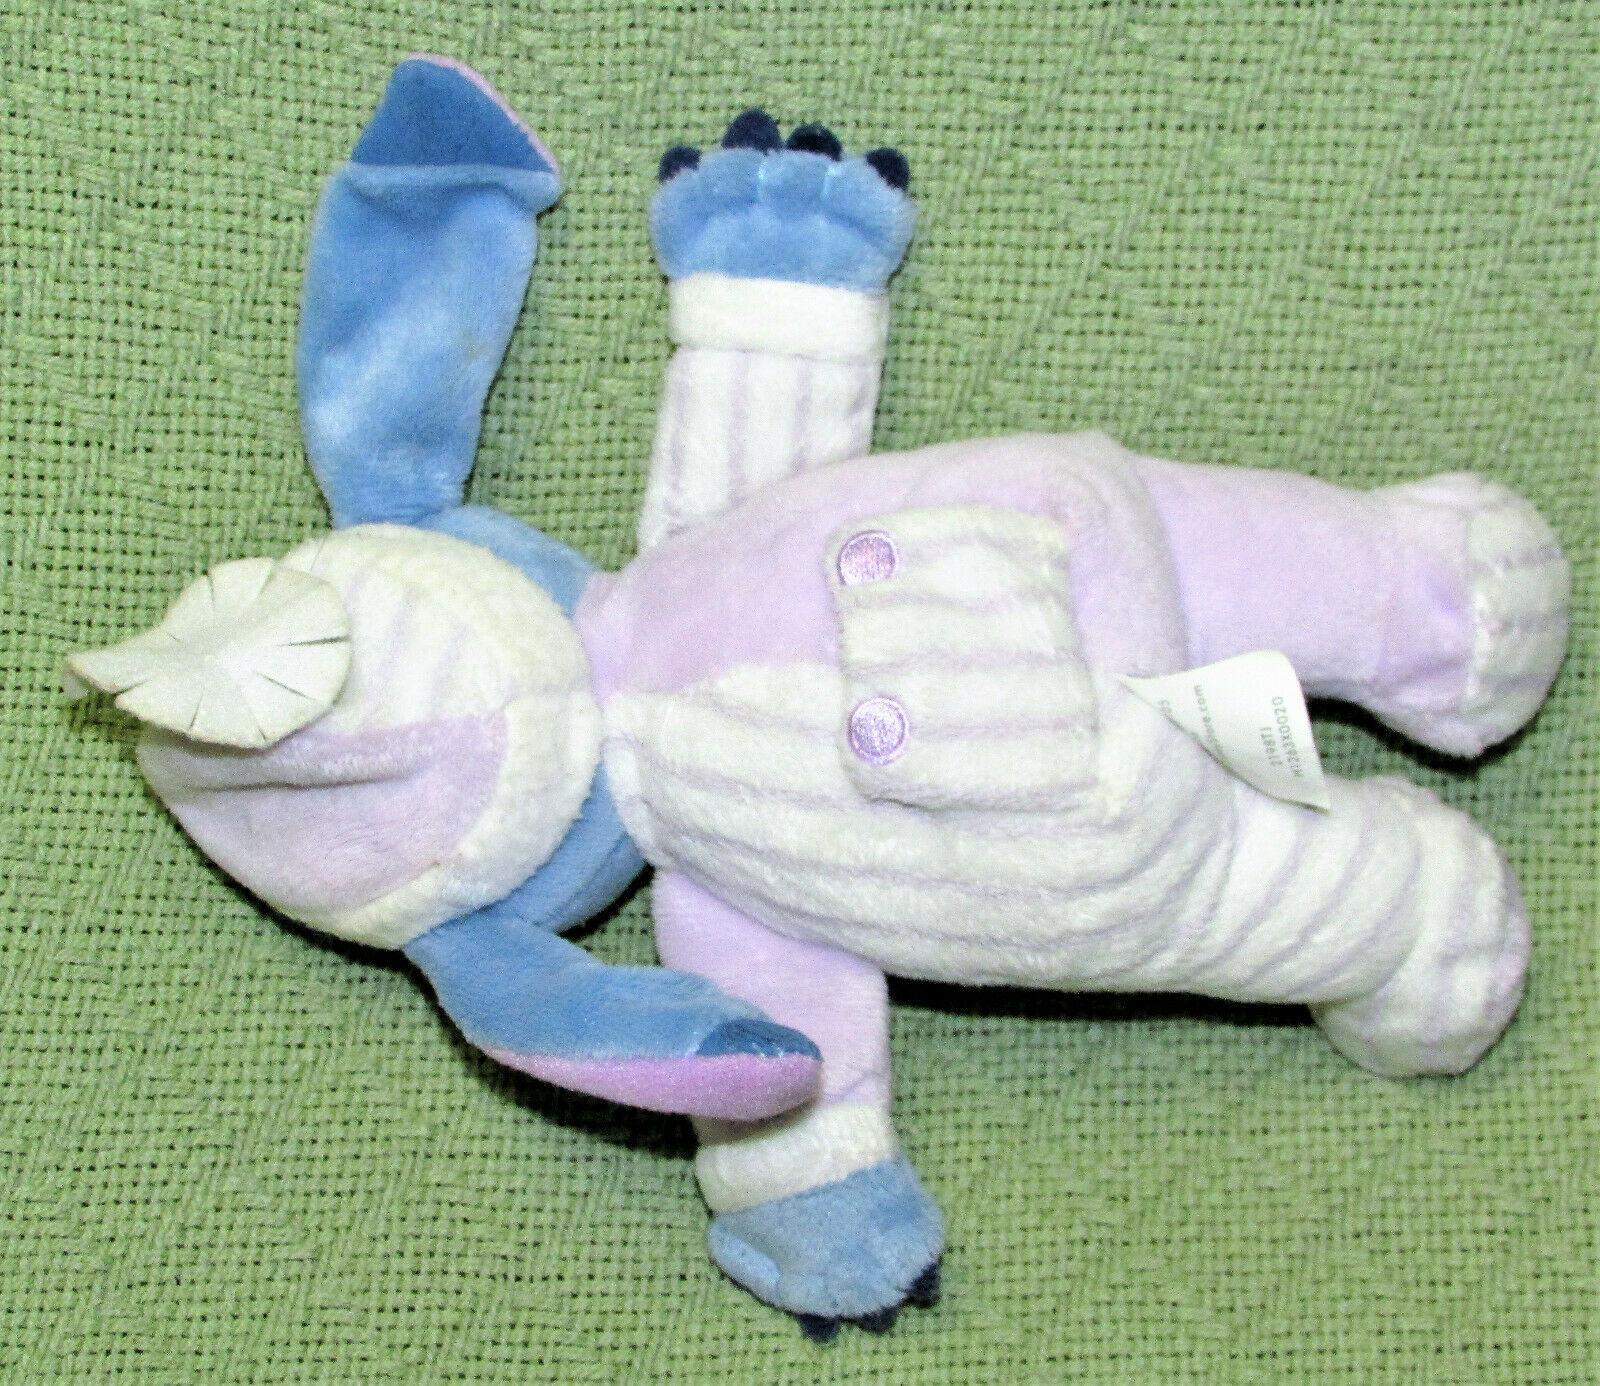 "DISNEY STORE LILO AND STITCH 9"" PLUSH PAJAMA STITCH STUFFED ANIMAL PURPLE PJs  image 4"